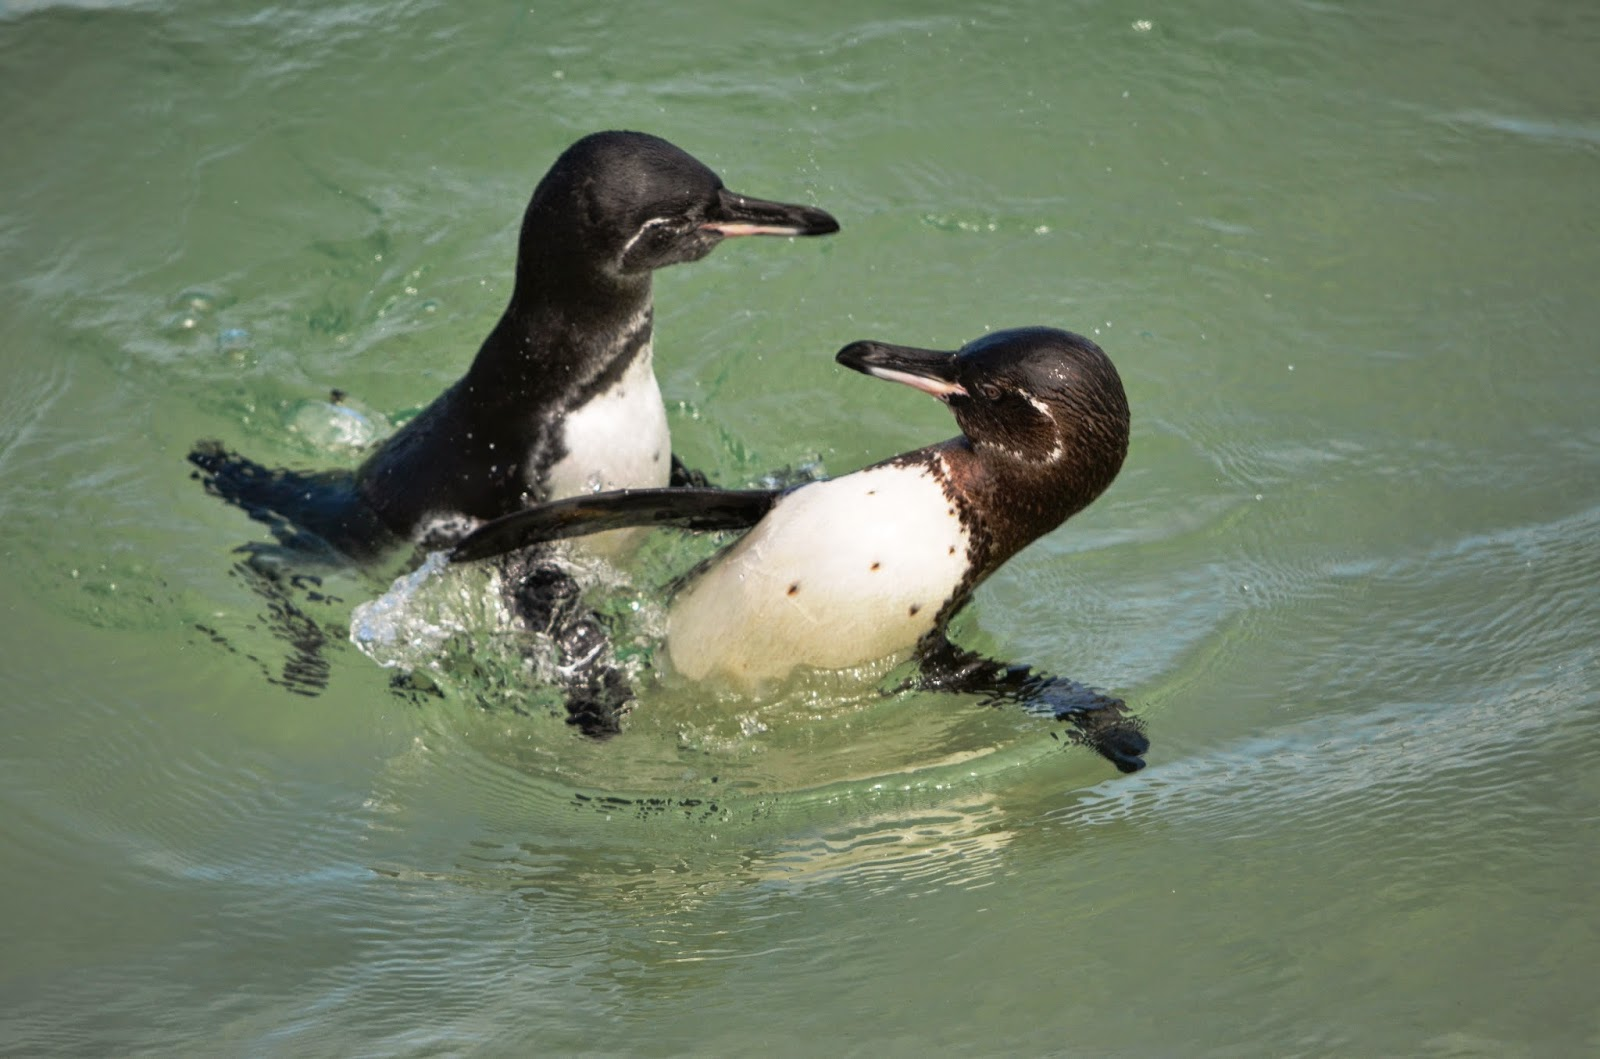 terrandes adventure ecuador galapagos reisen gal pagos pinguin. Black Bedroom Furniture Sets. Home Design Ideas